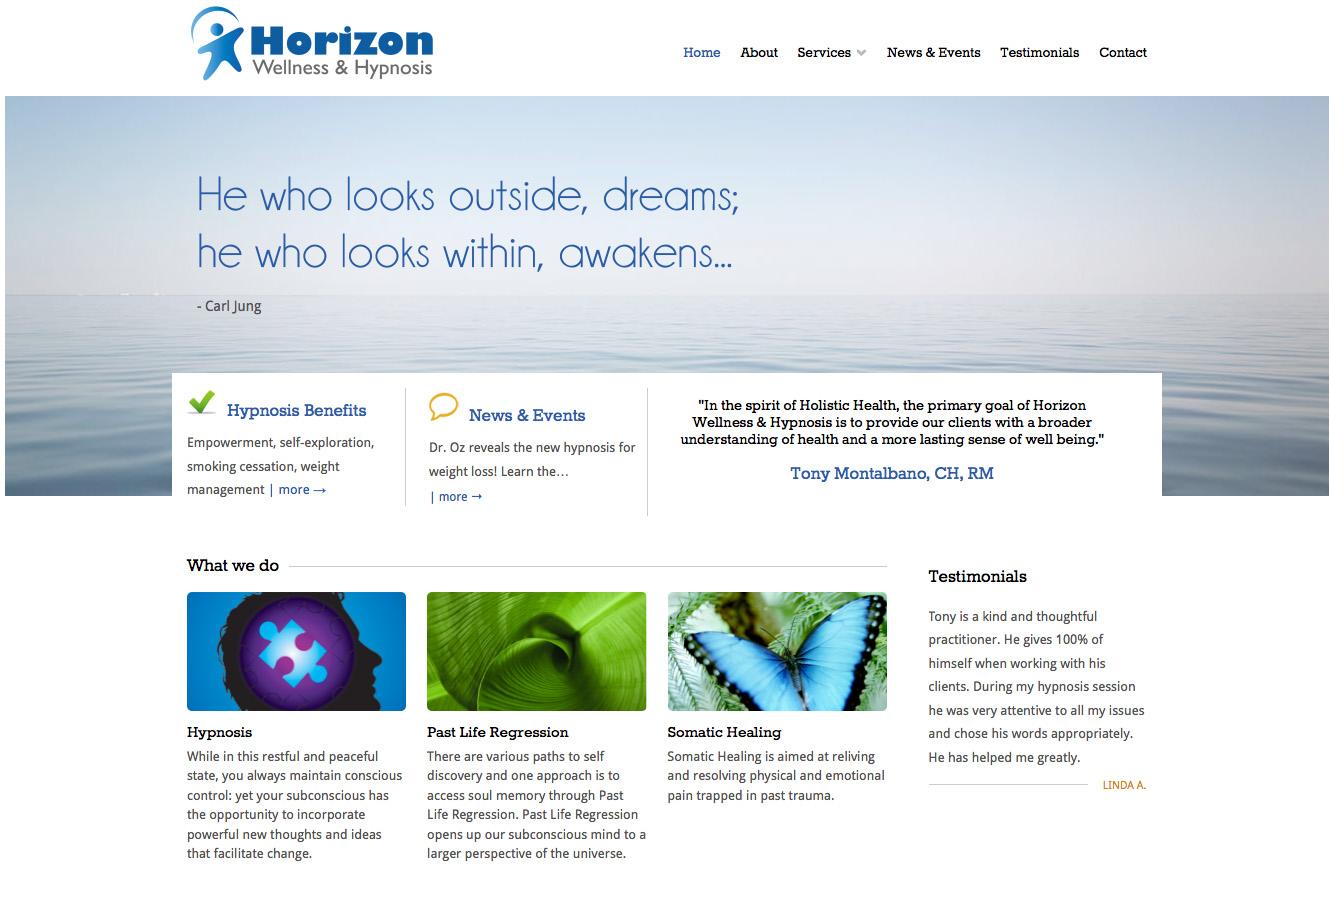 Horizon Wellness & Hypnosis | Clementyne Design